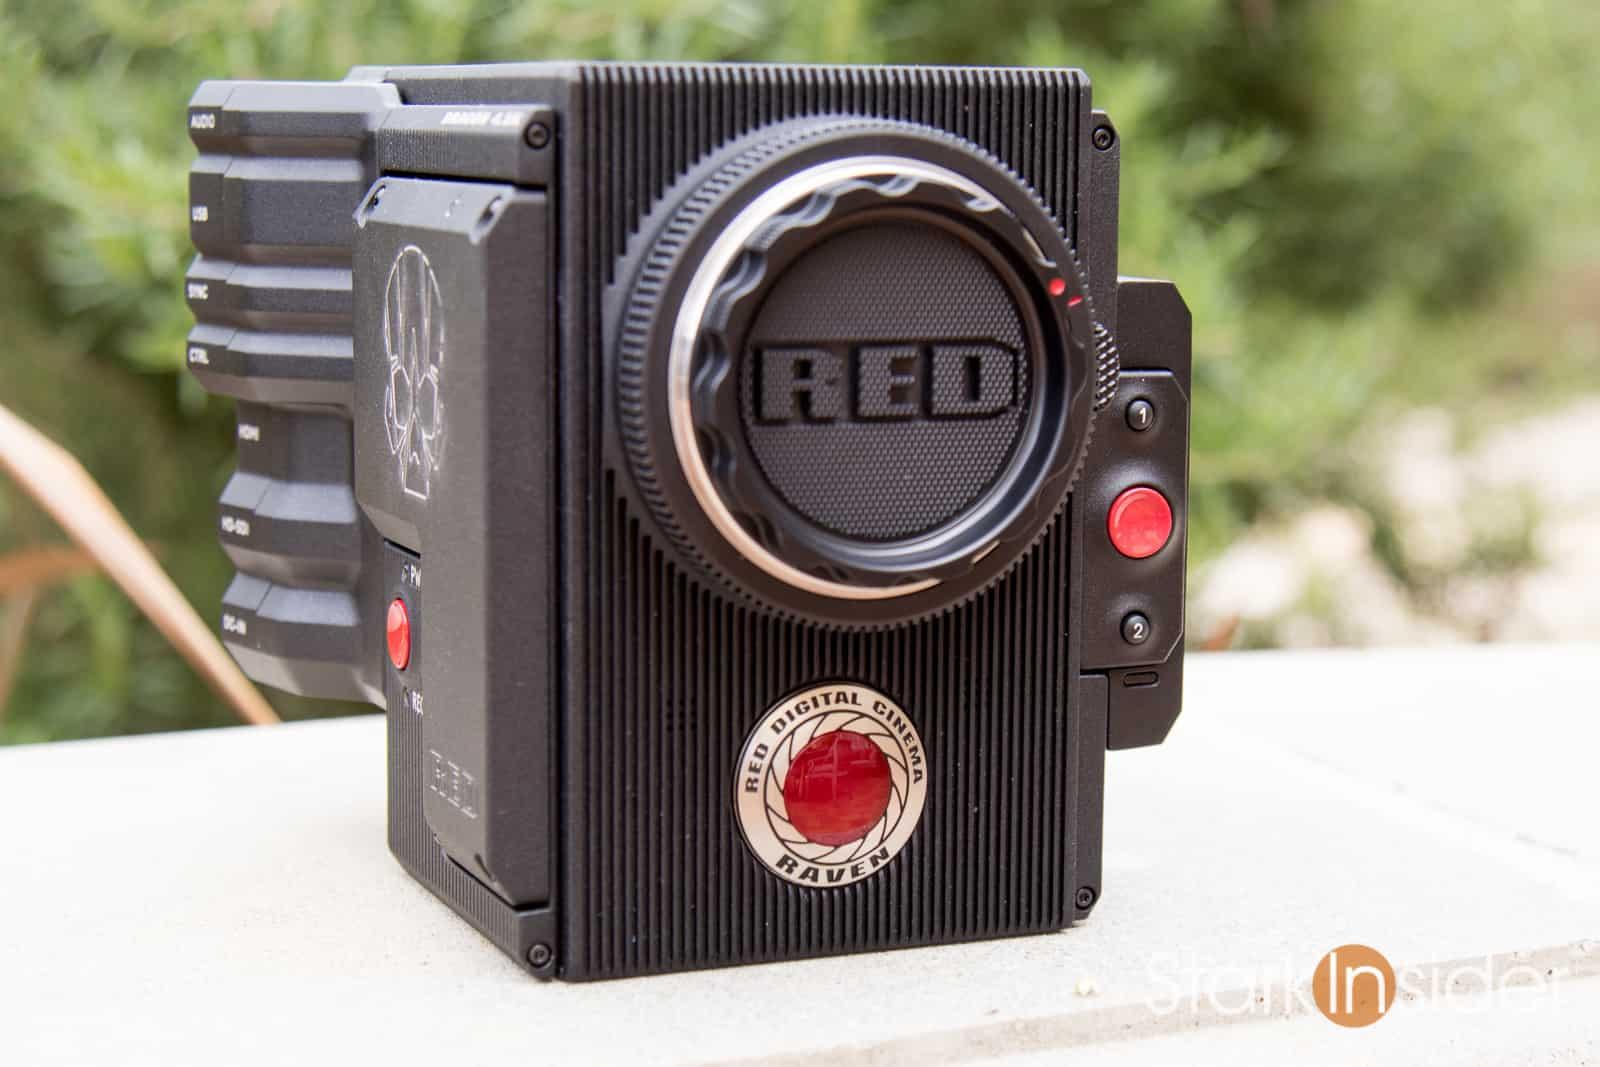 RED-Raven-Camera-Unboxing-Stark-Insider-8734